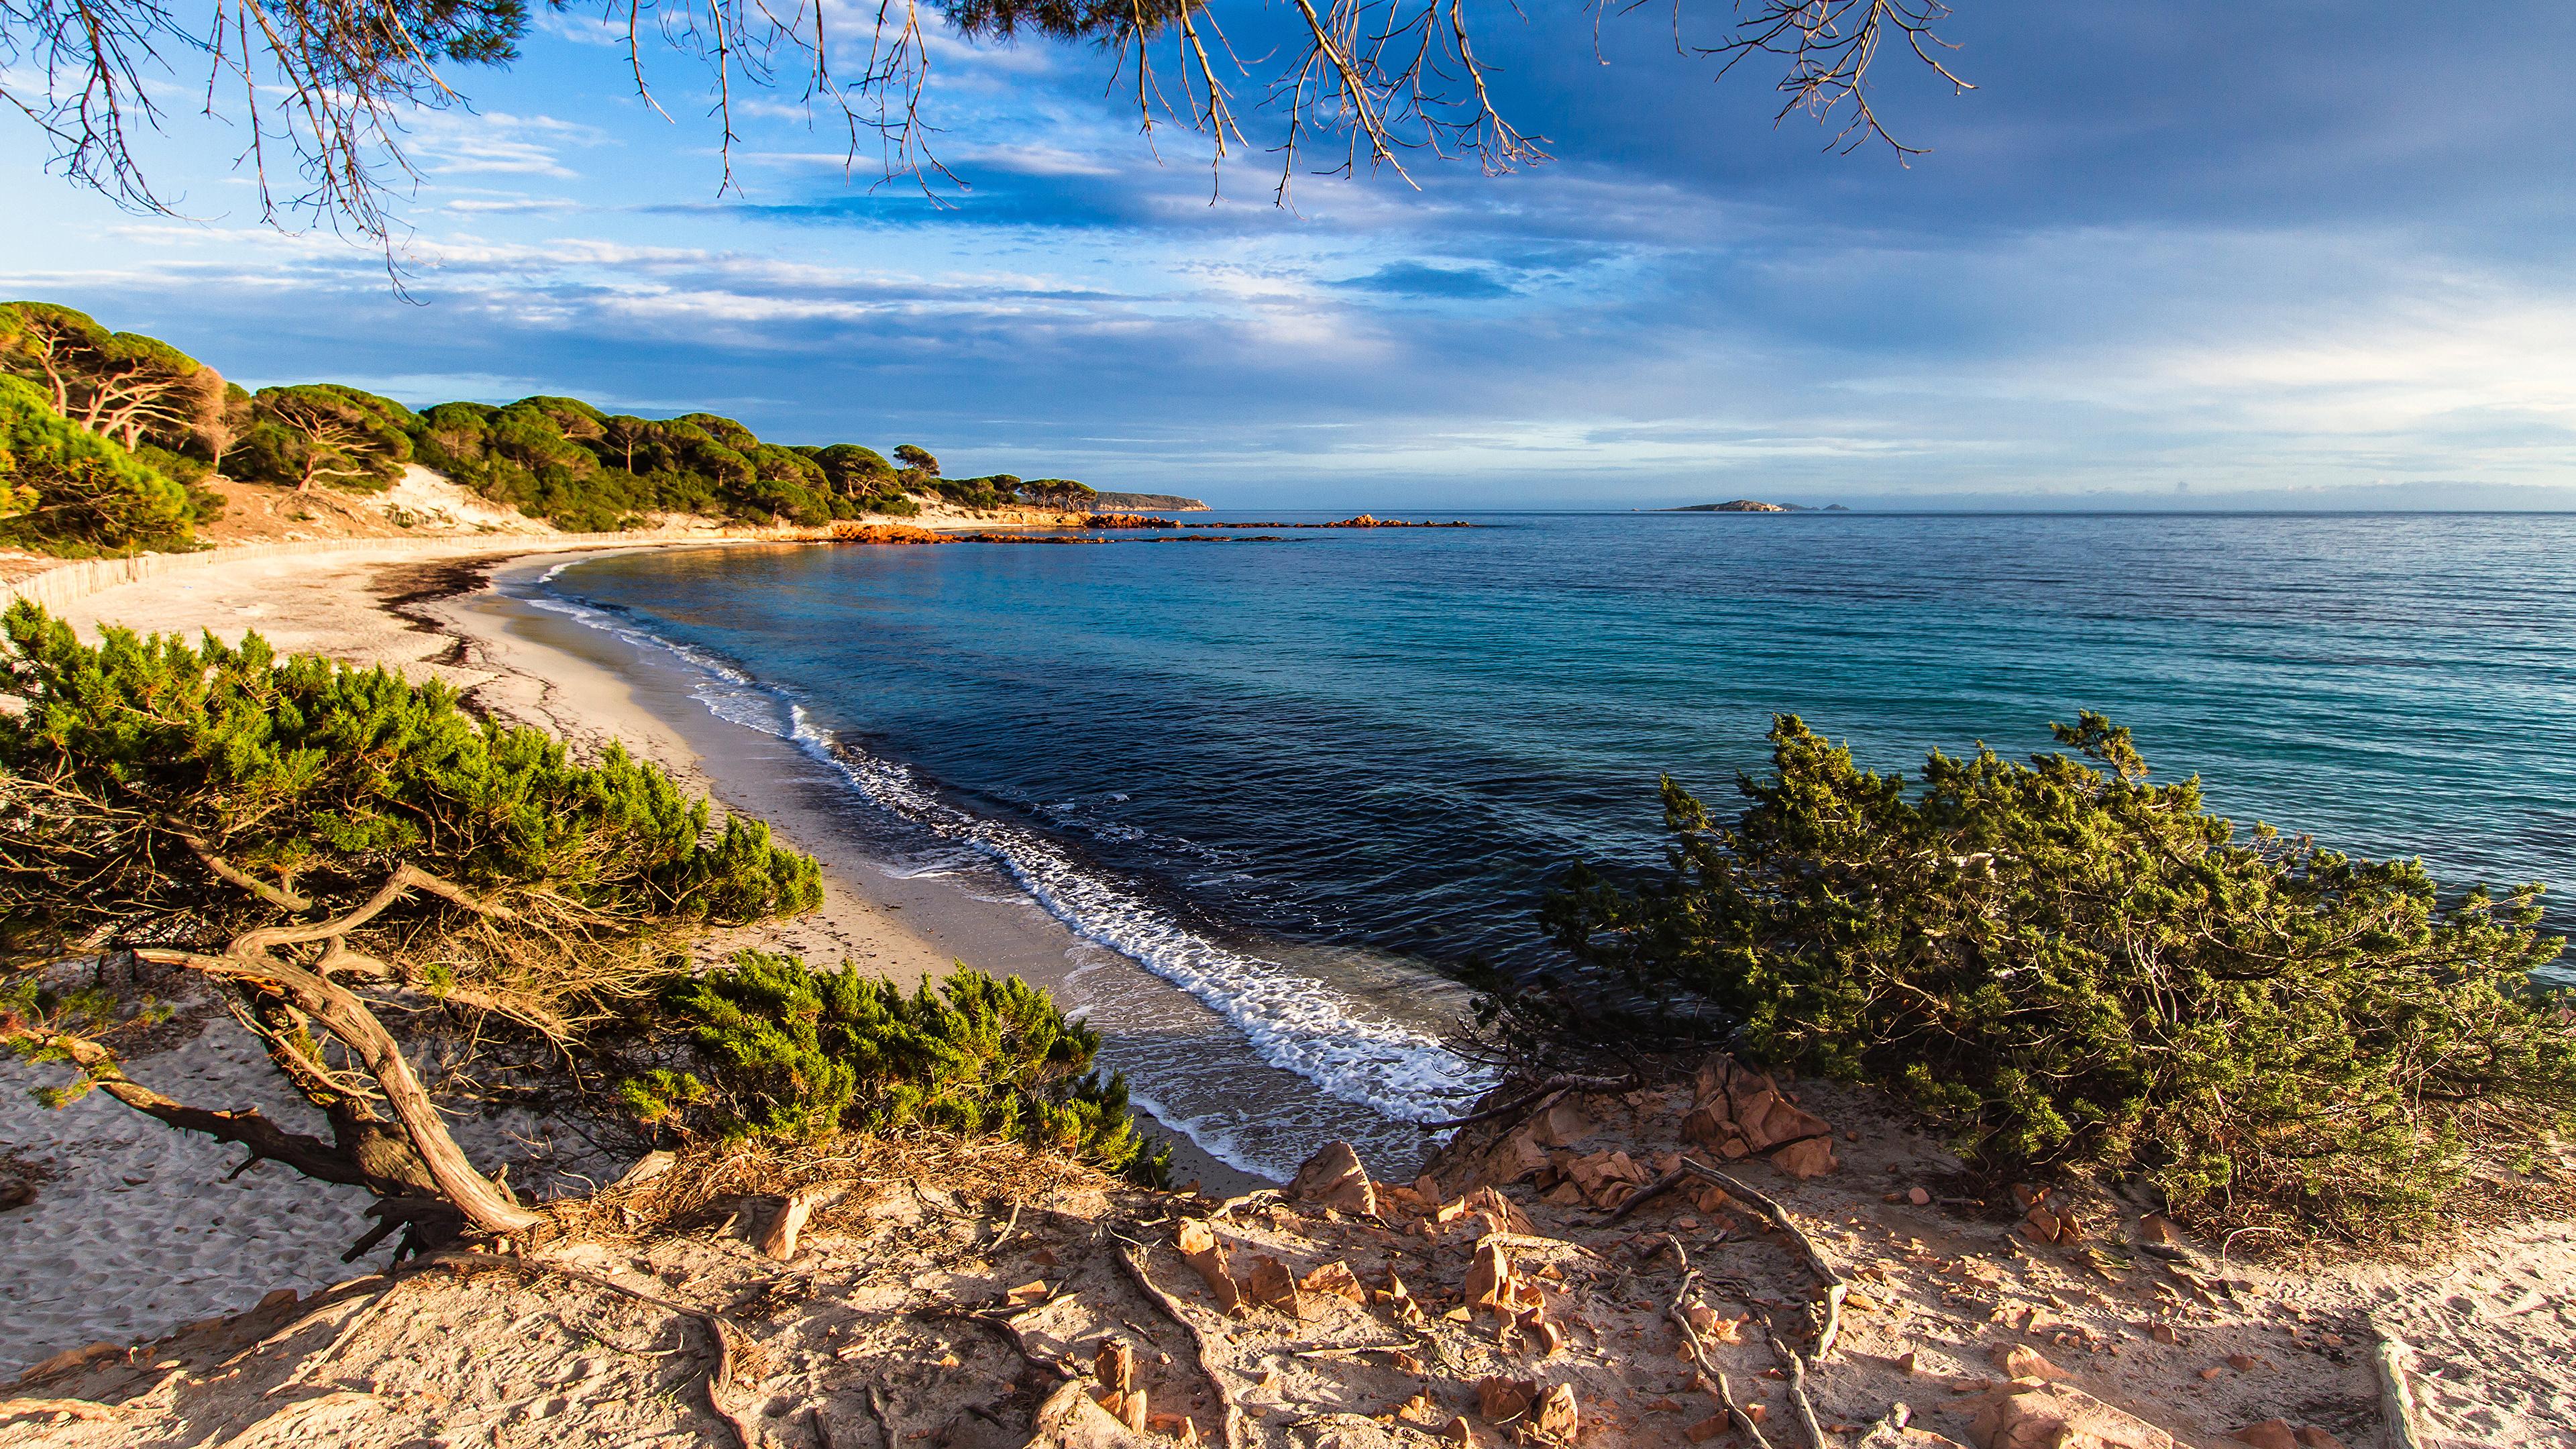 Desktop Wallpapers France Corsica Nature Waves Coast 3840x2160 3840x2160